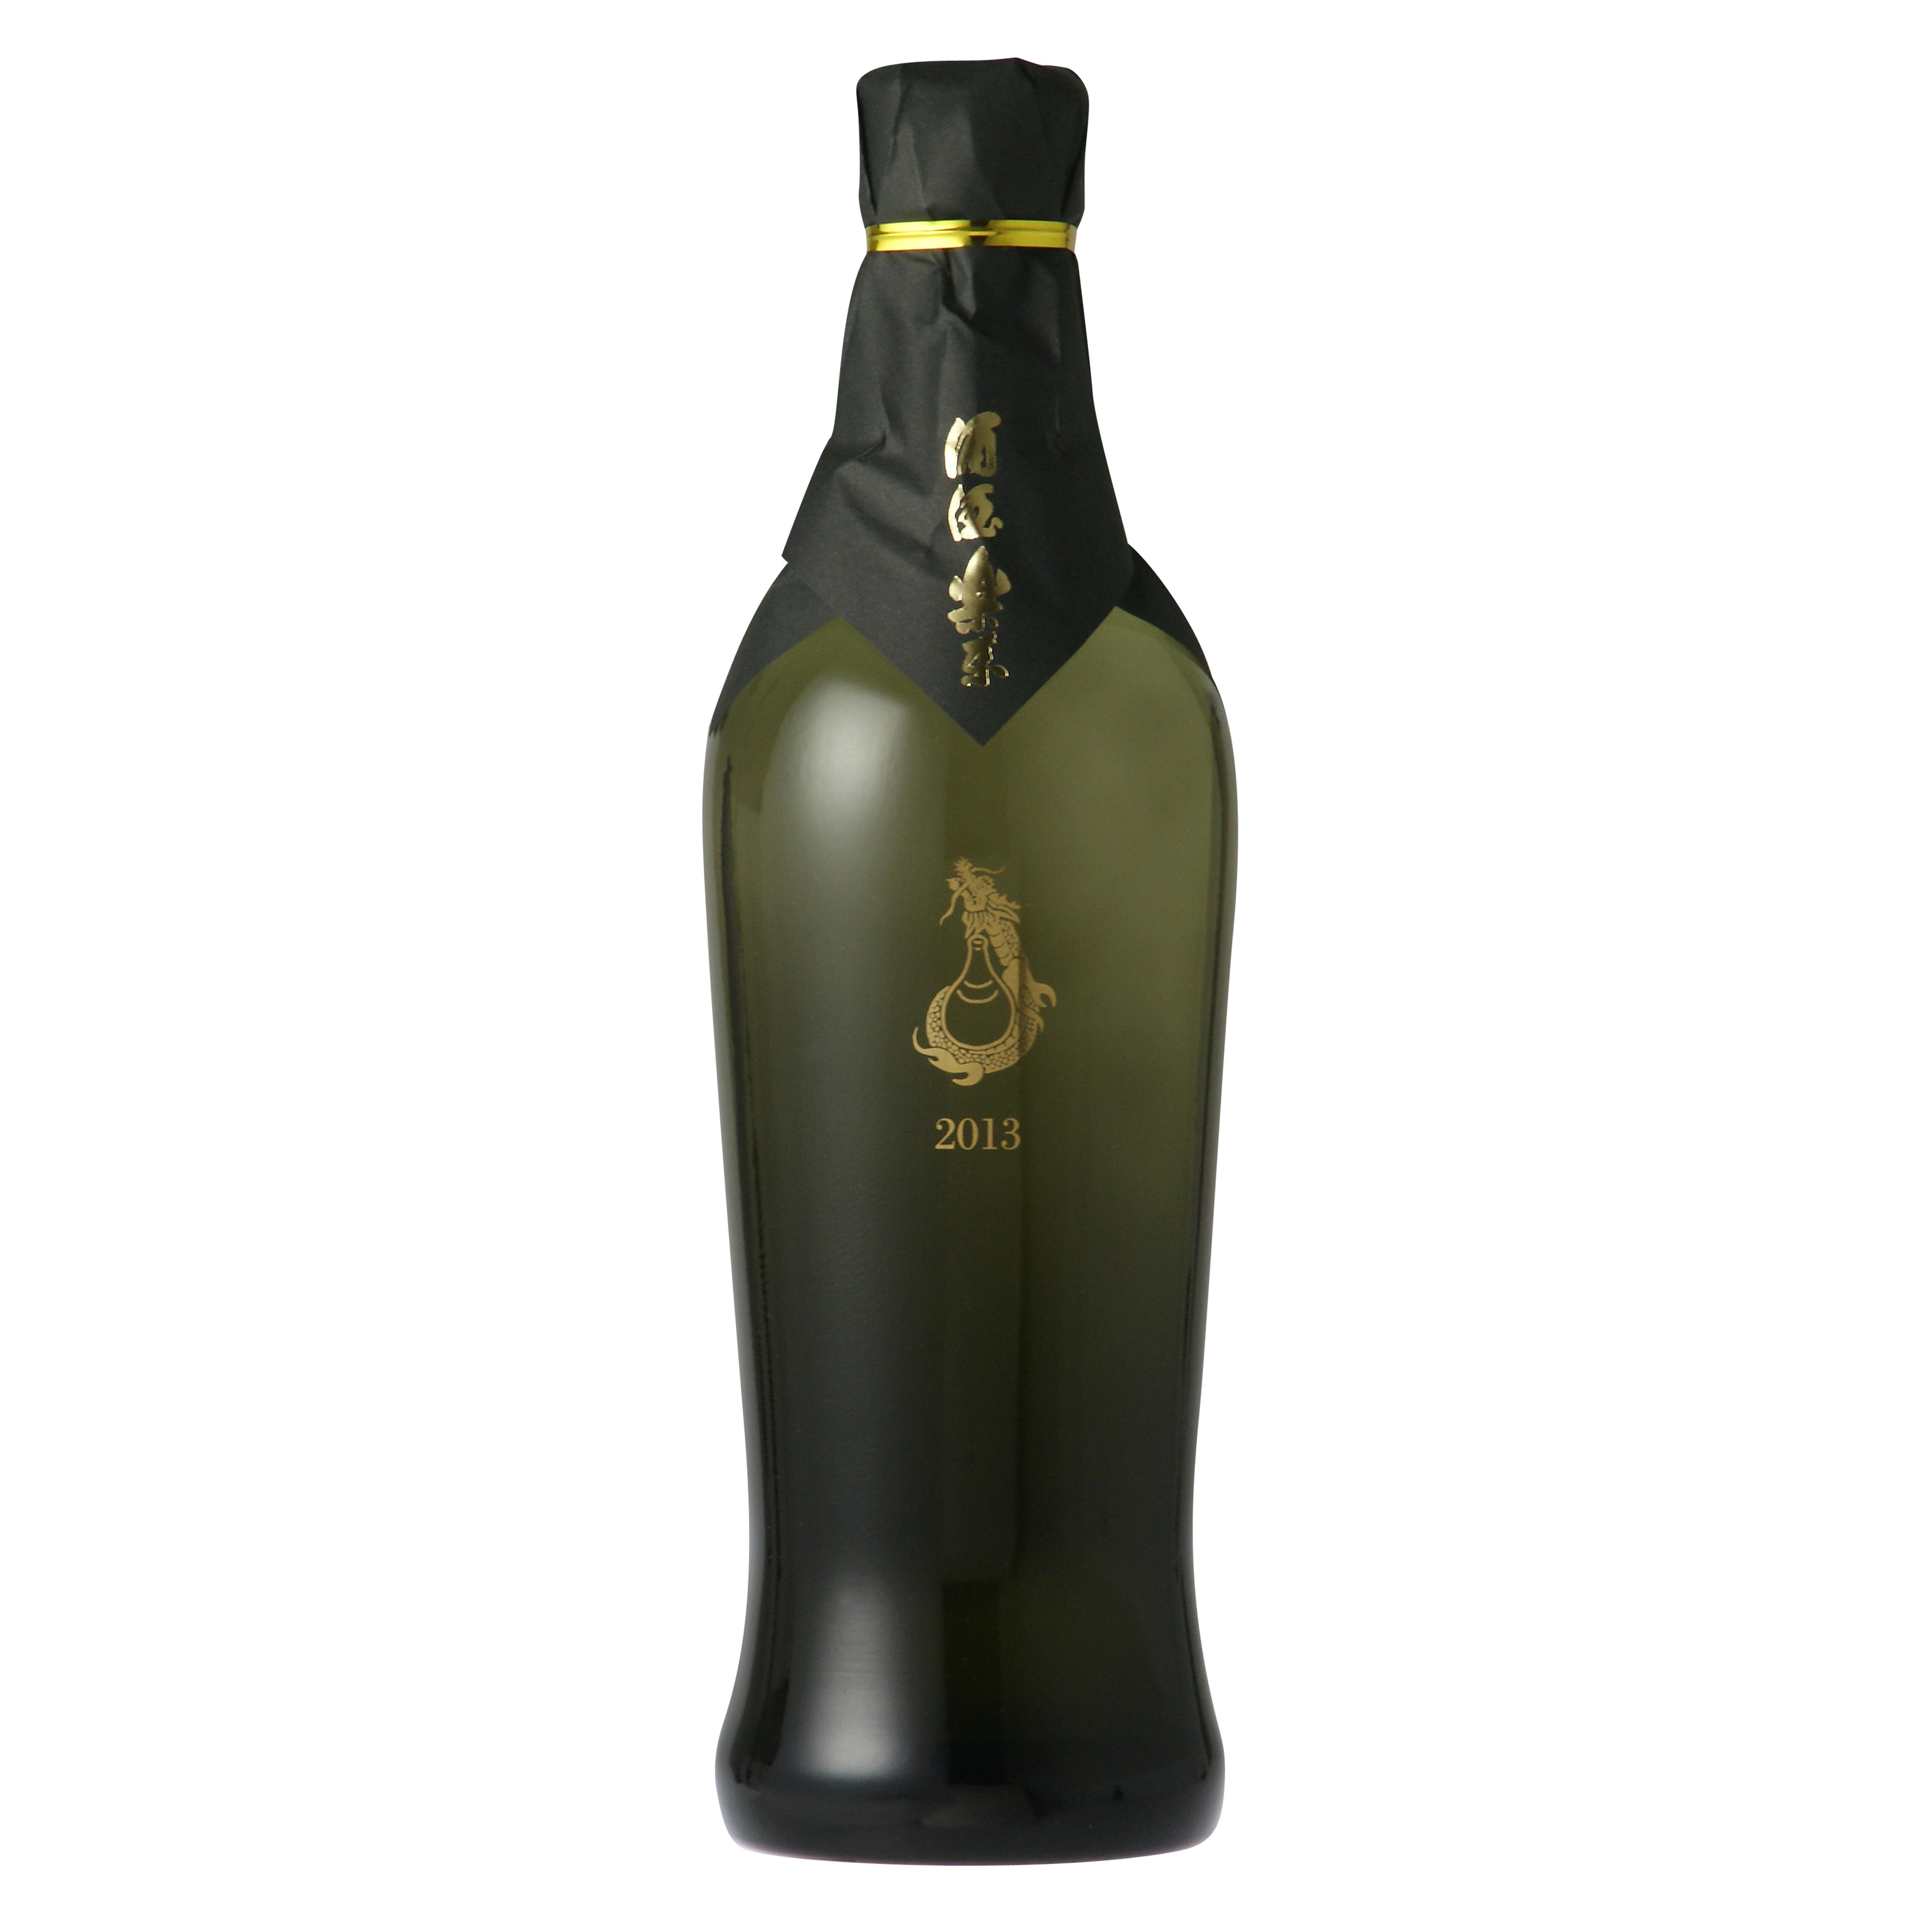 Grand Cru 酒酒楽楽(しゃらく) 【専用化粧箱・専用グラス付き】